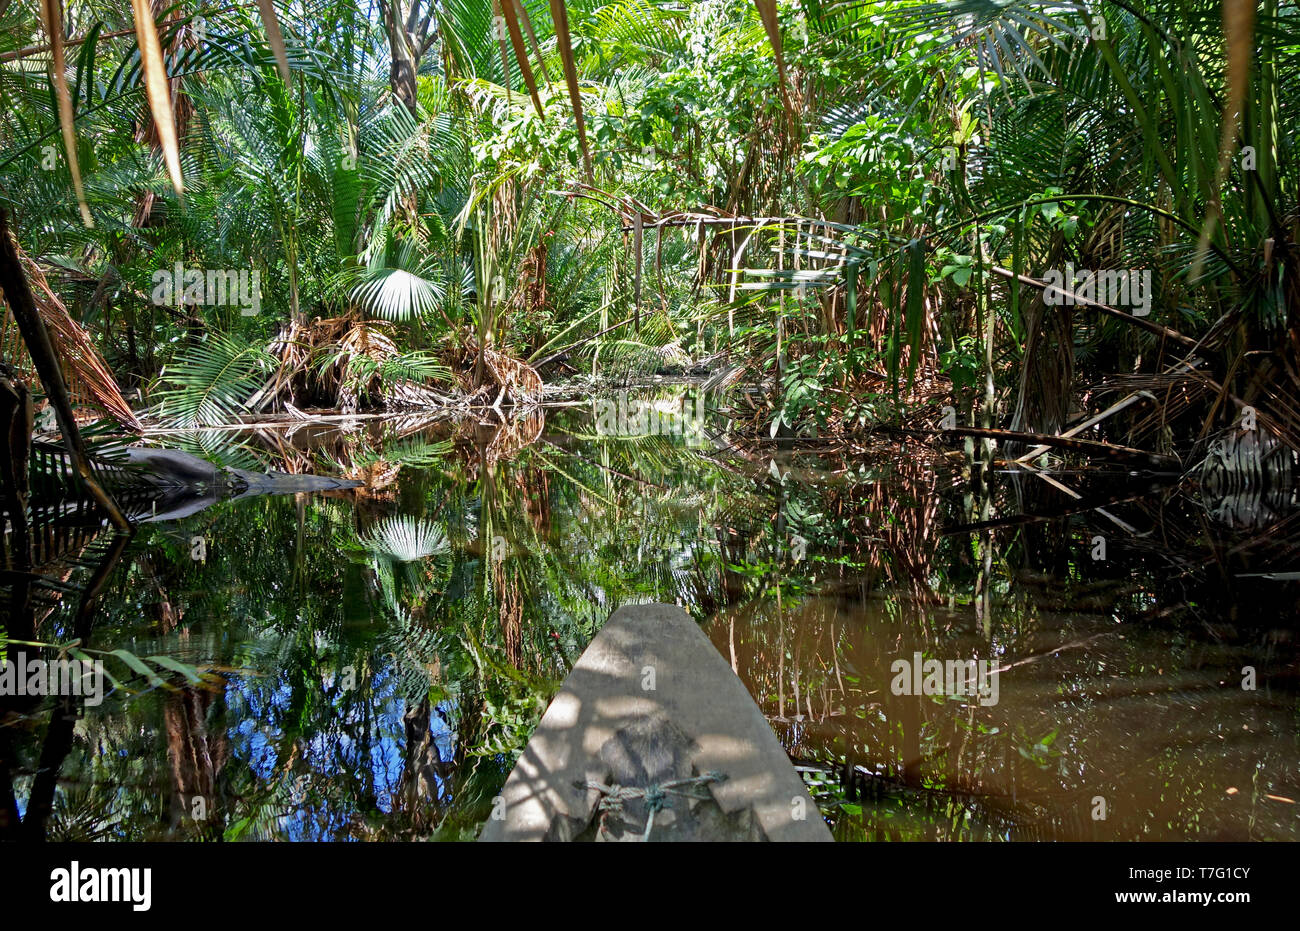 Landscape of Mentawai the island of Sumatra in Indonesia. - Stock Image